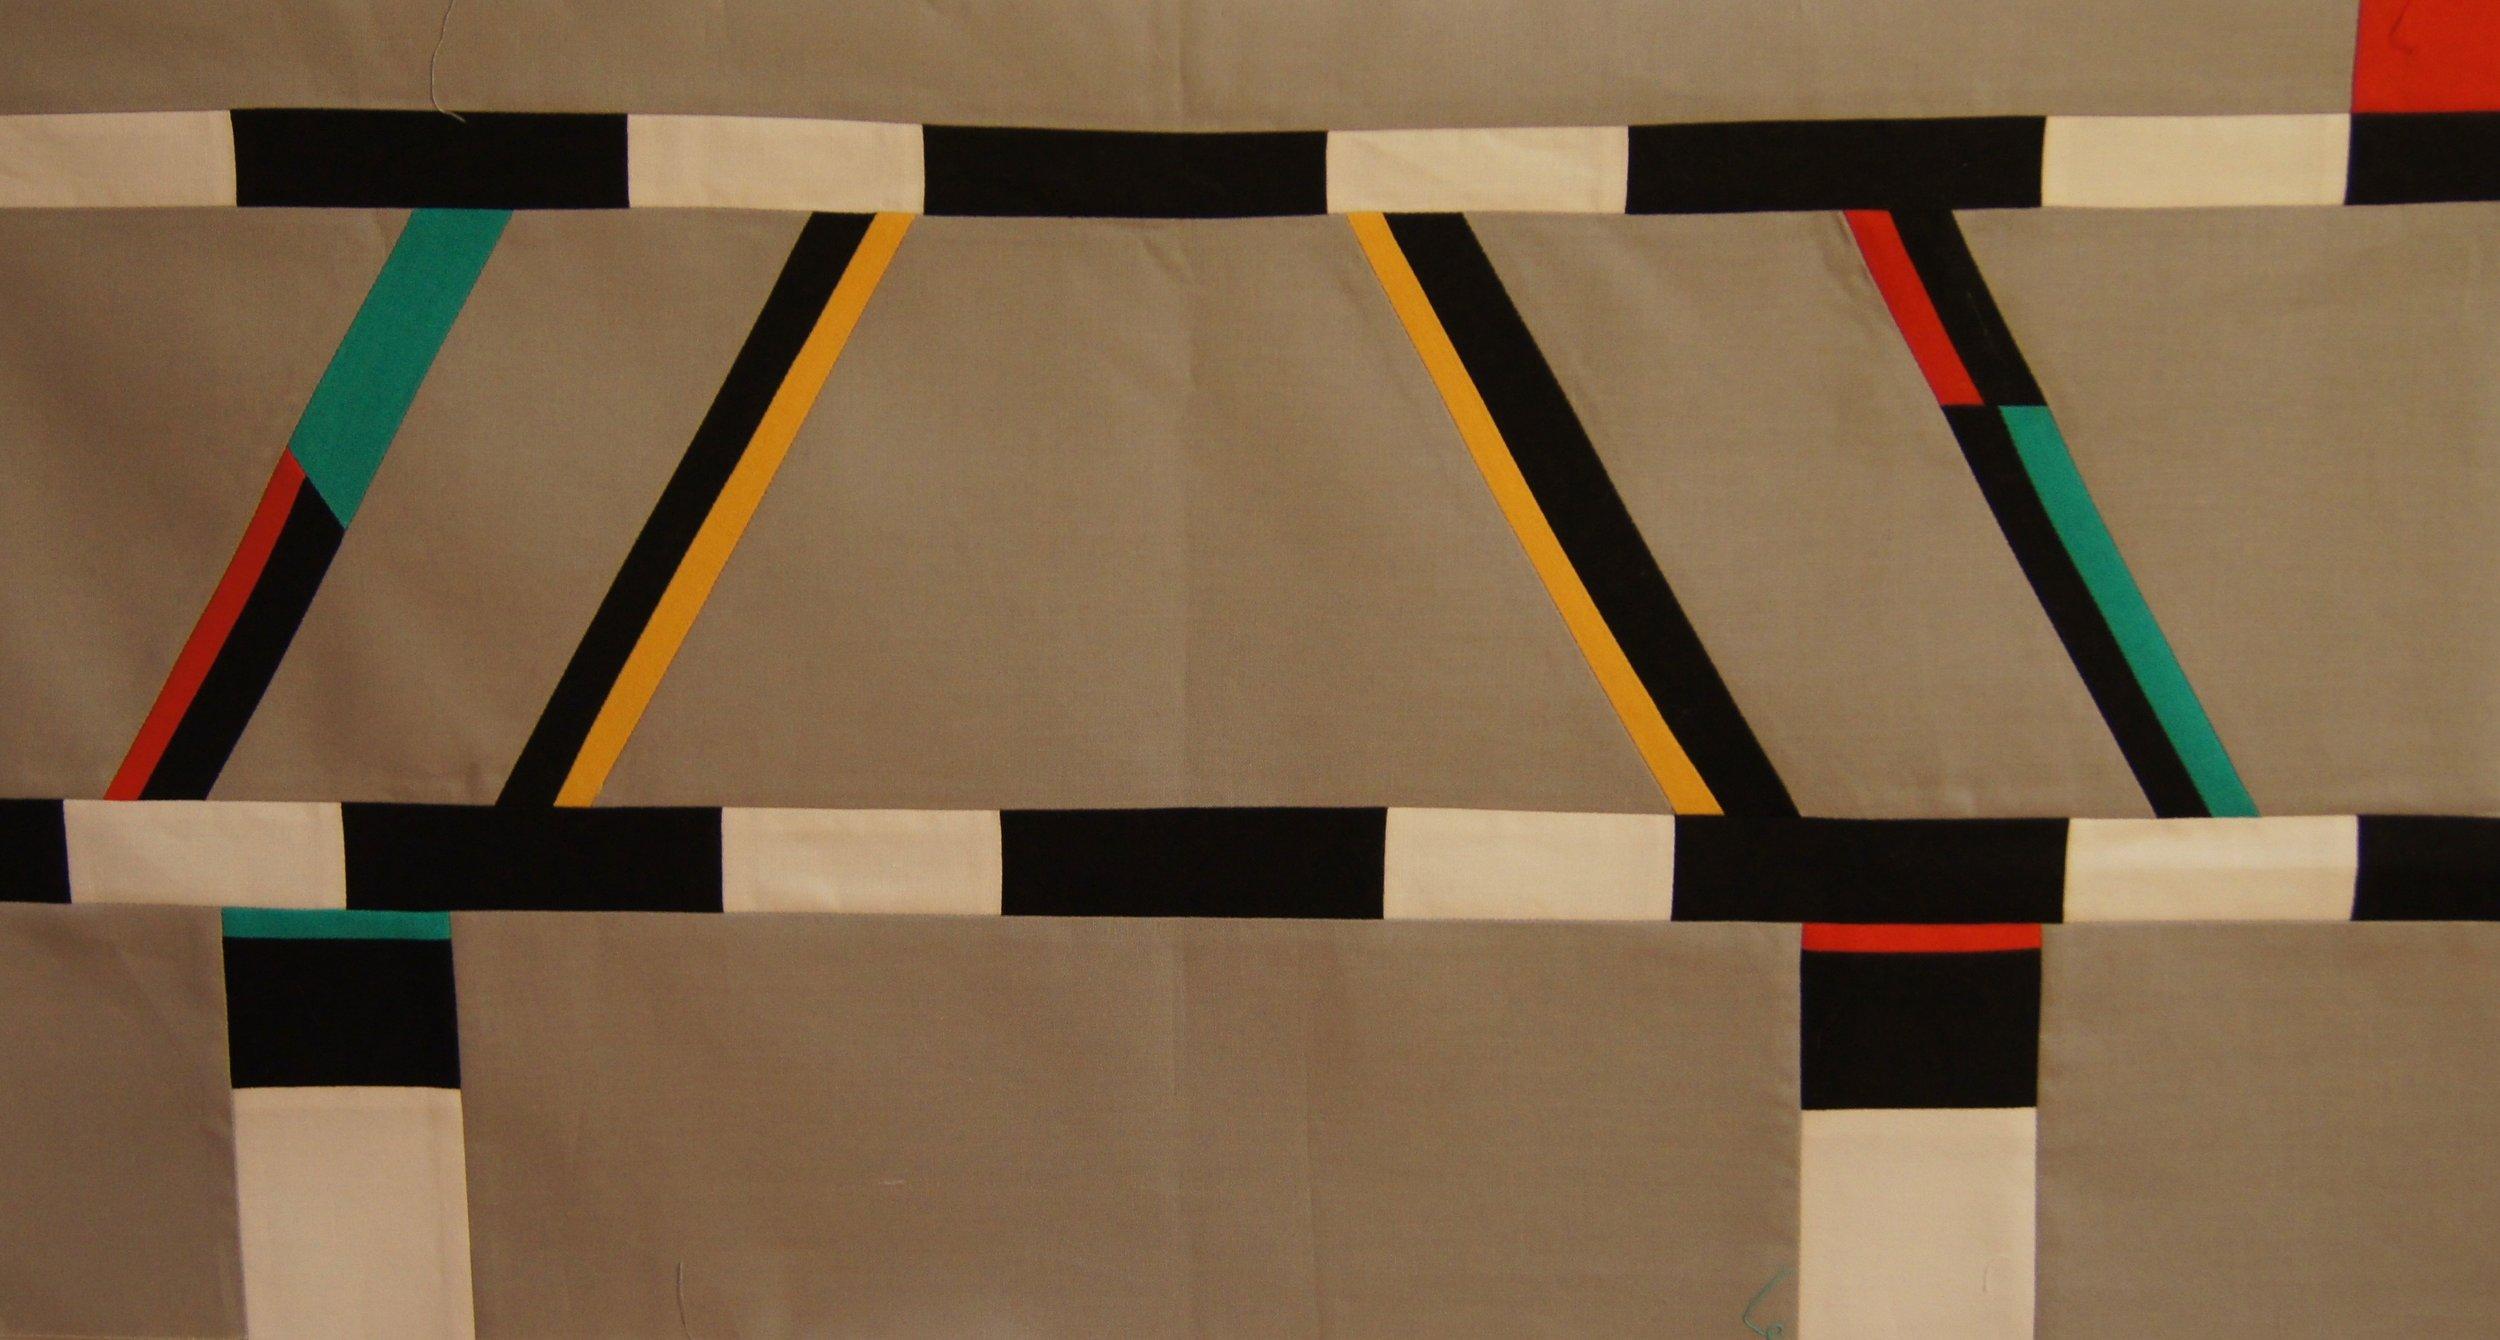 Audrey's abstracted bridge